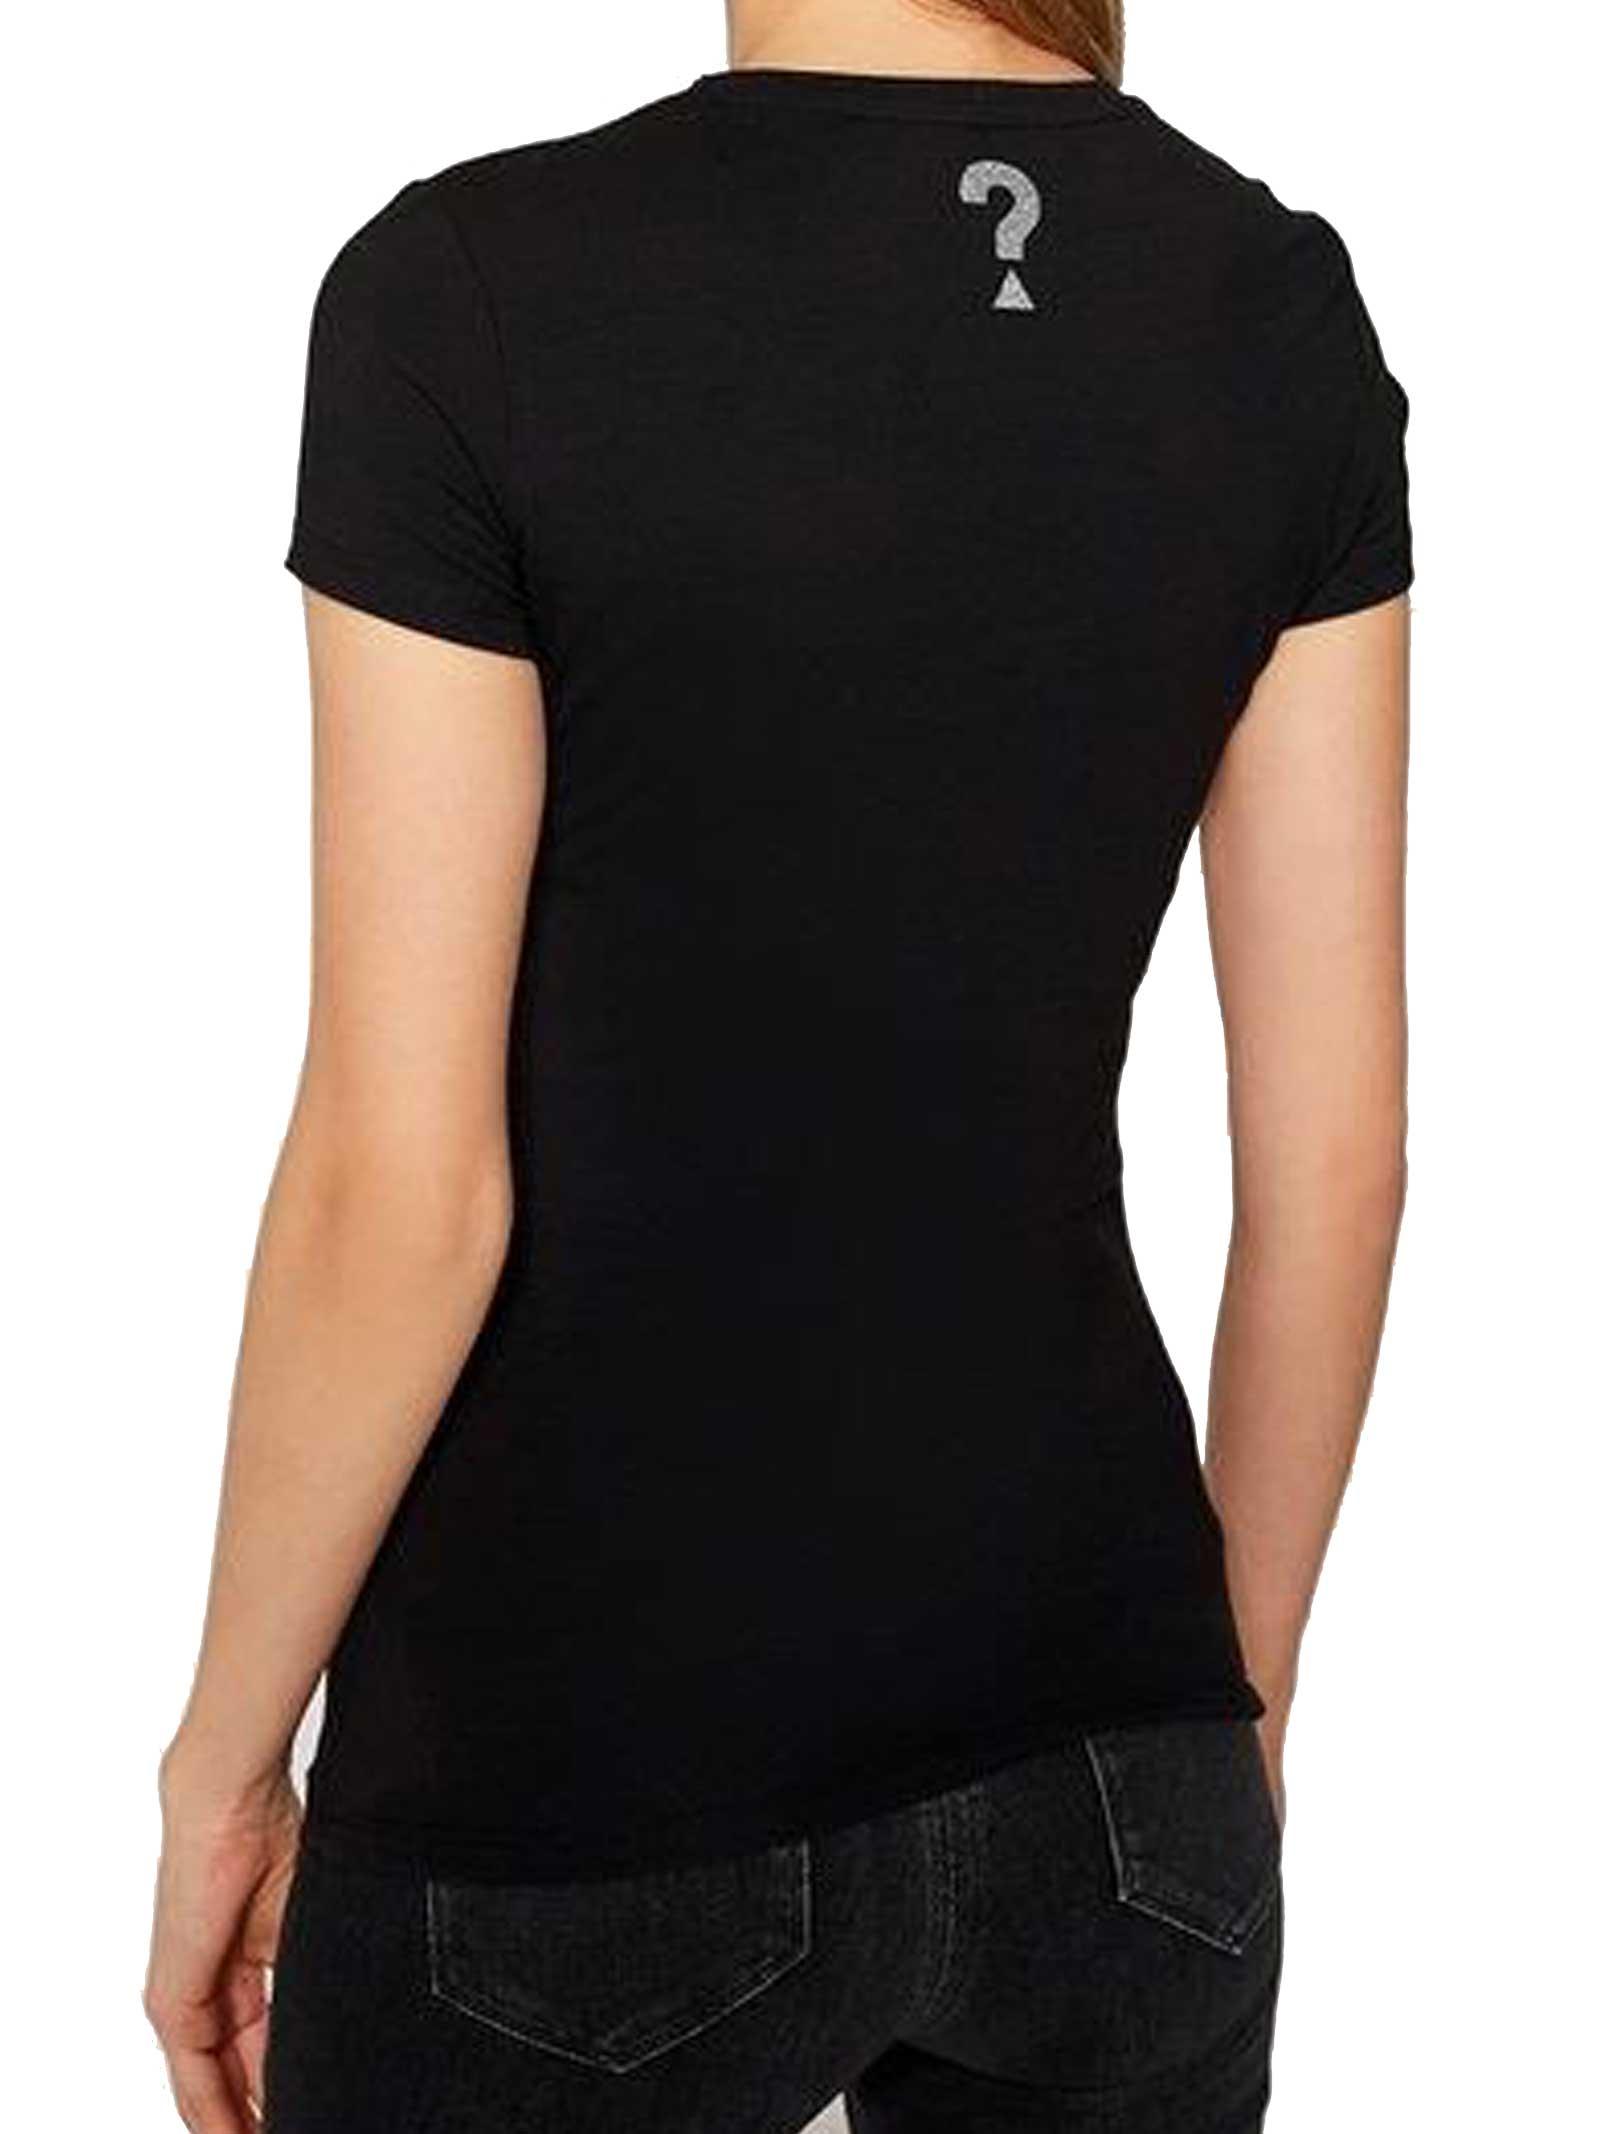 T-SHIRT DONNA GUESS   T-shirt   W1RI9G-J1300JBLK